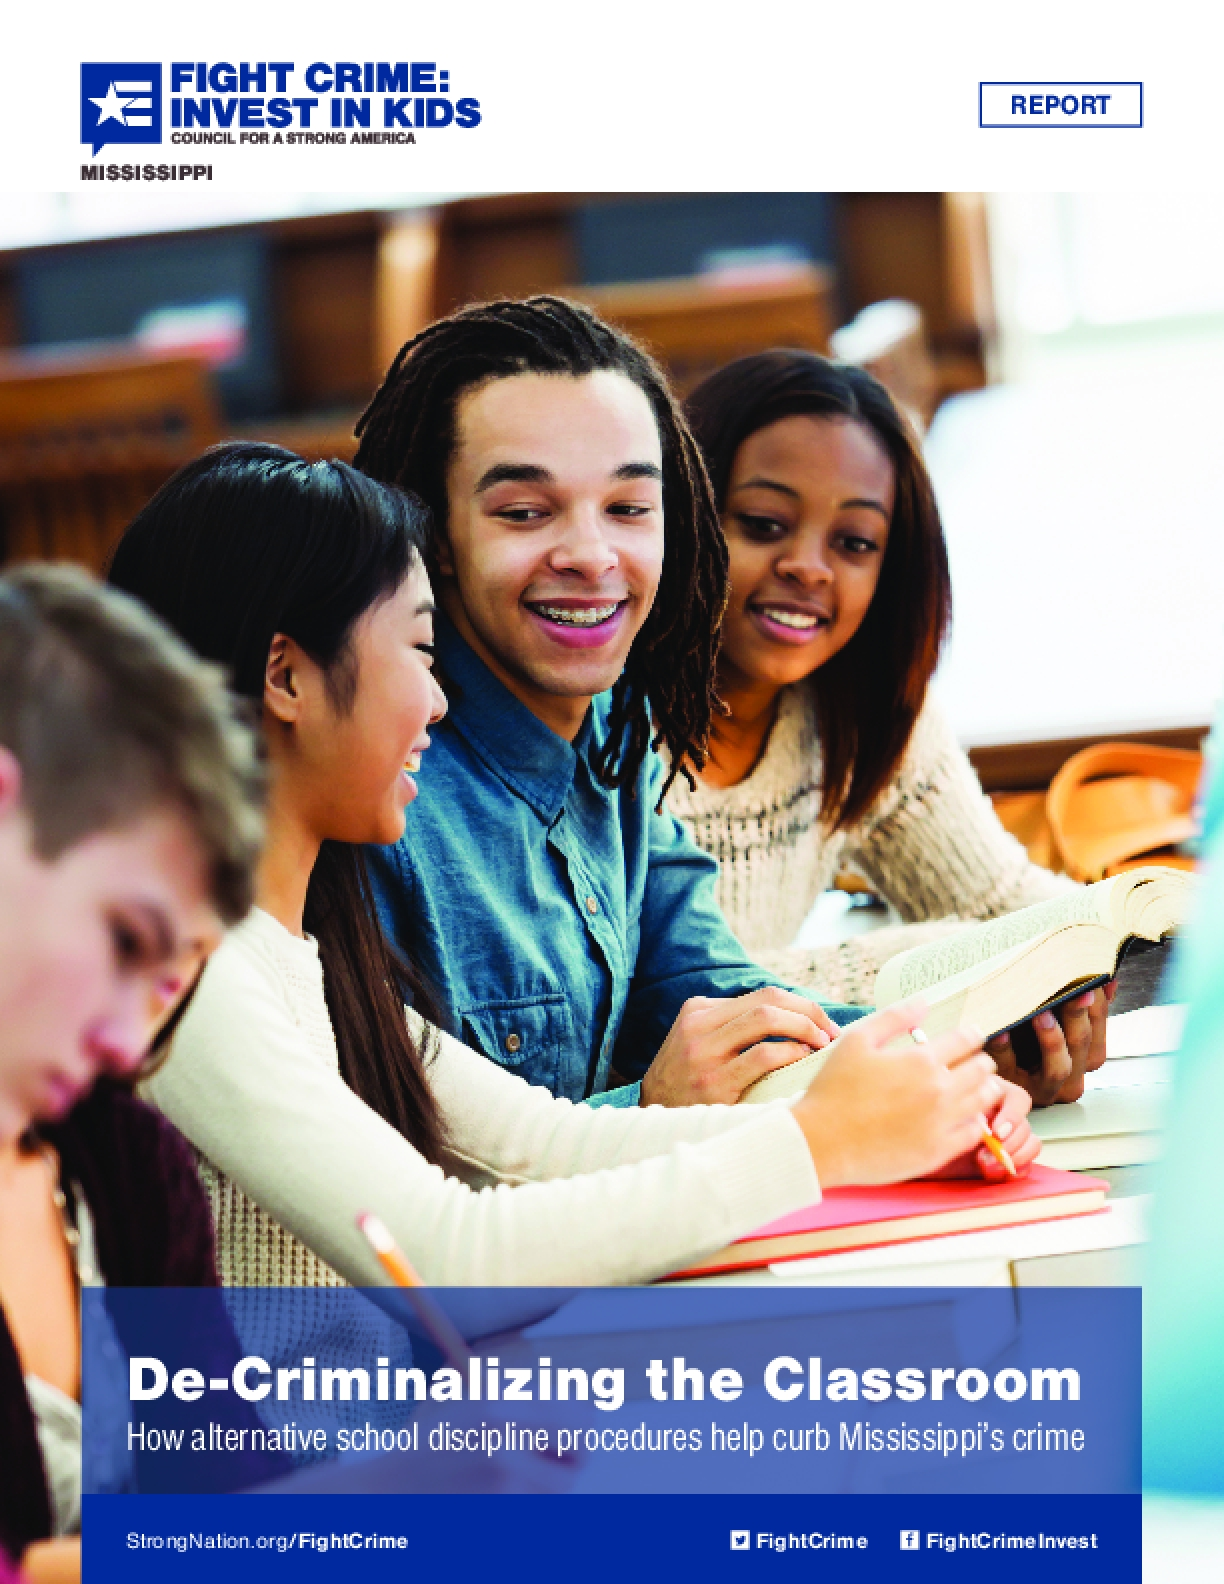 De-Criminalizing the Classroom in Mississippi: How Alternative School Discipline Procedures Help Curb Crime